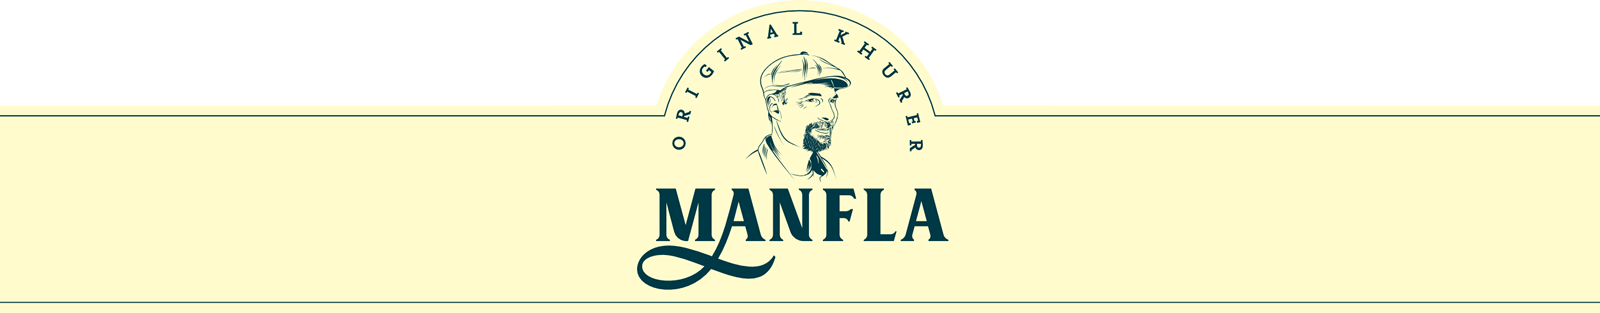 manfla-logo-balken